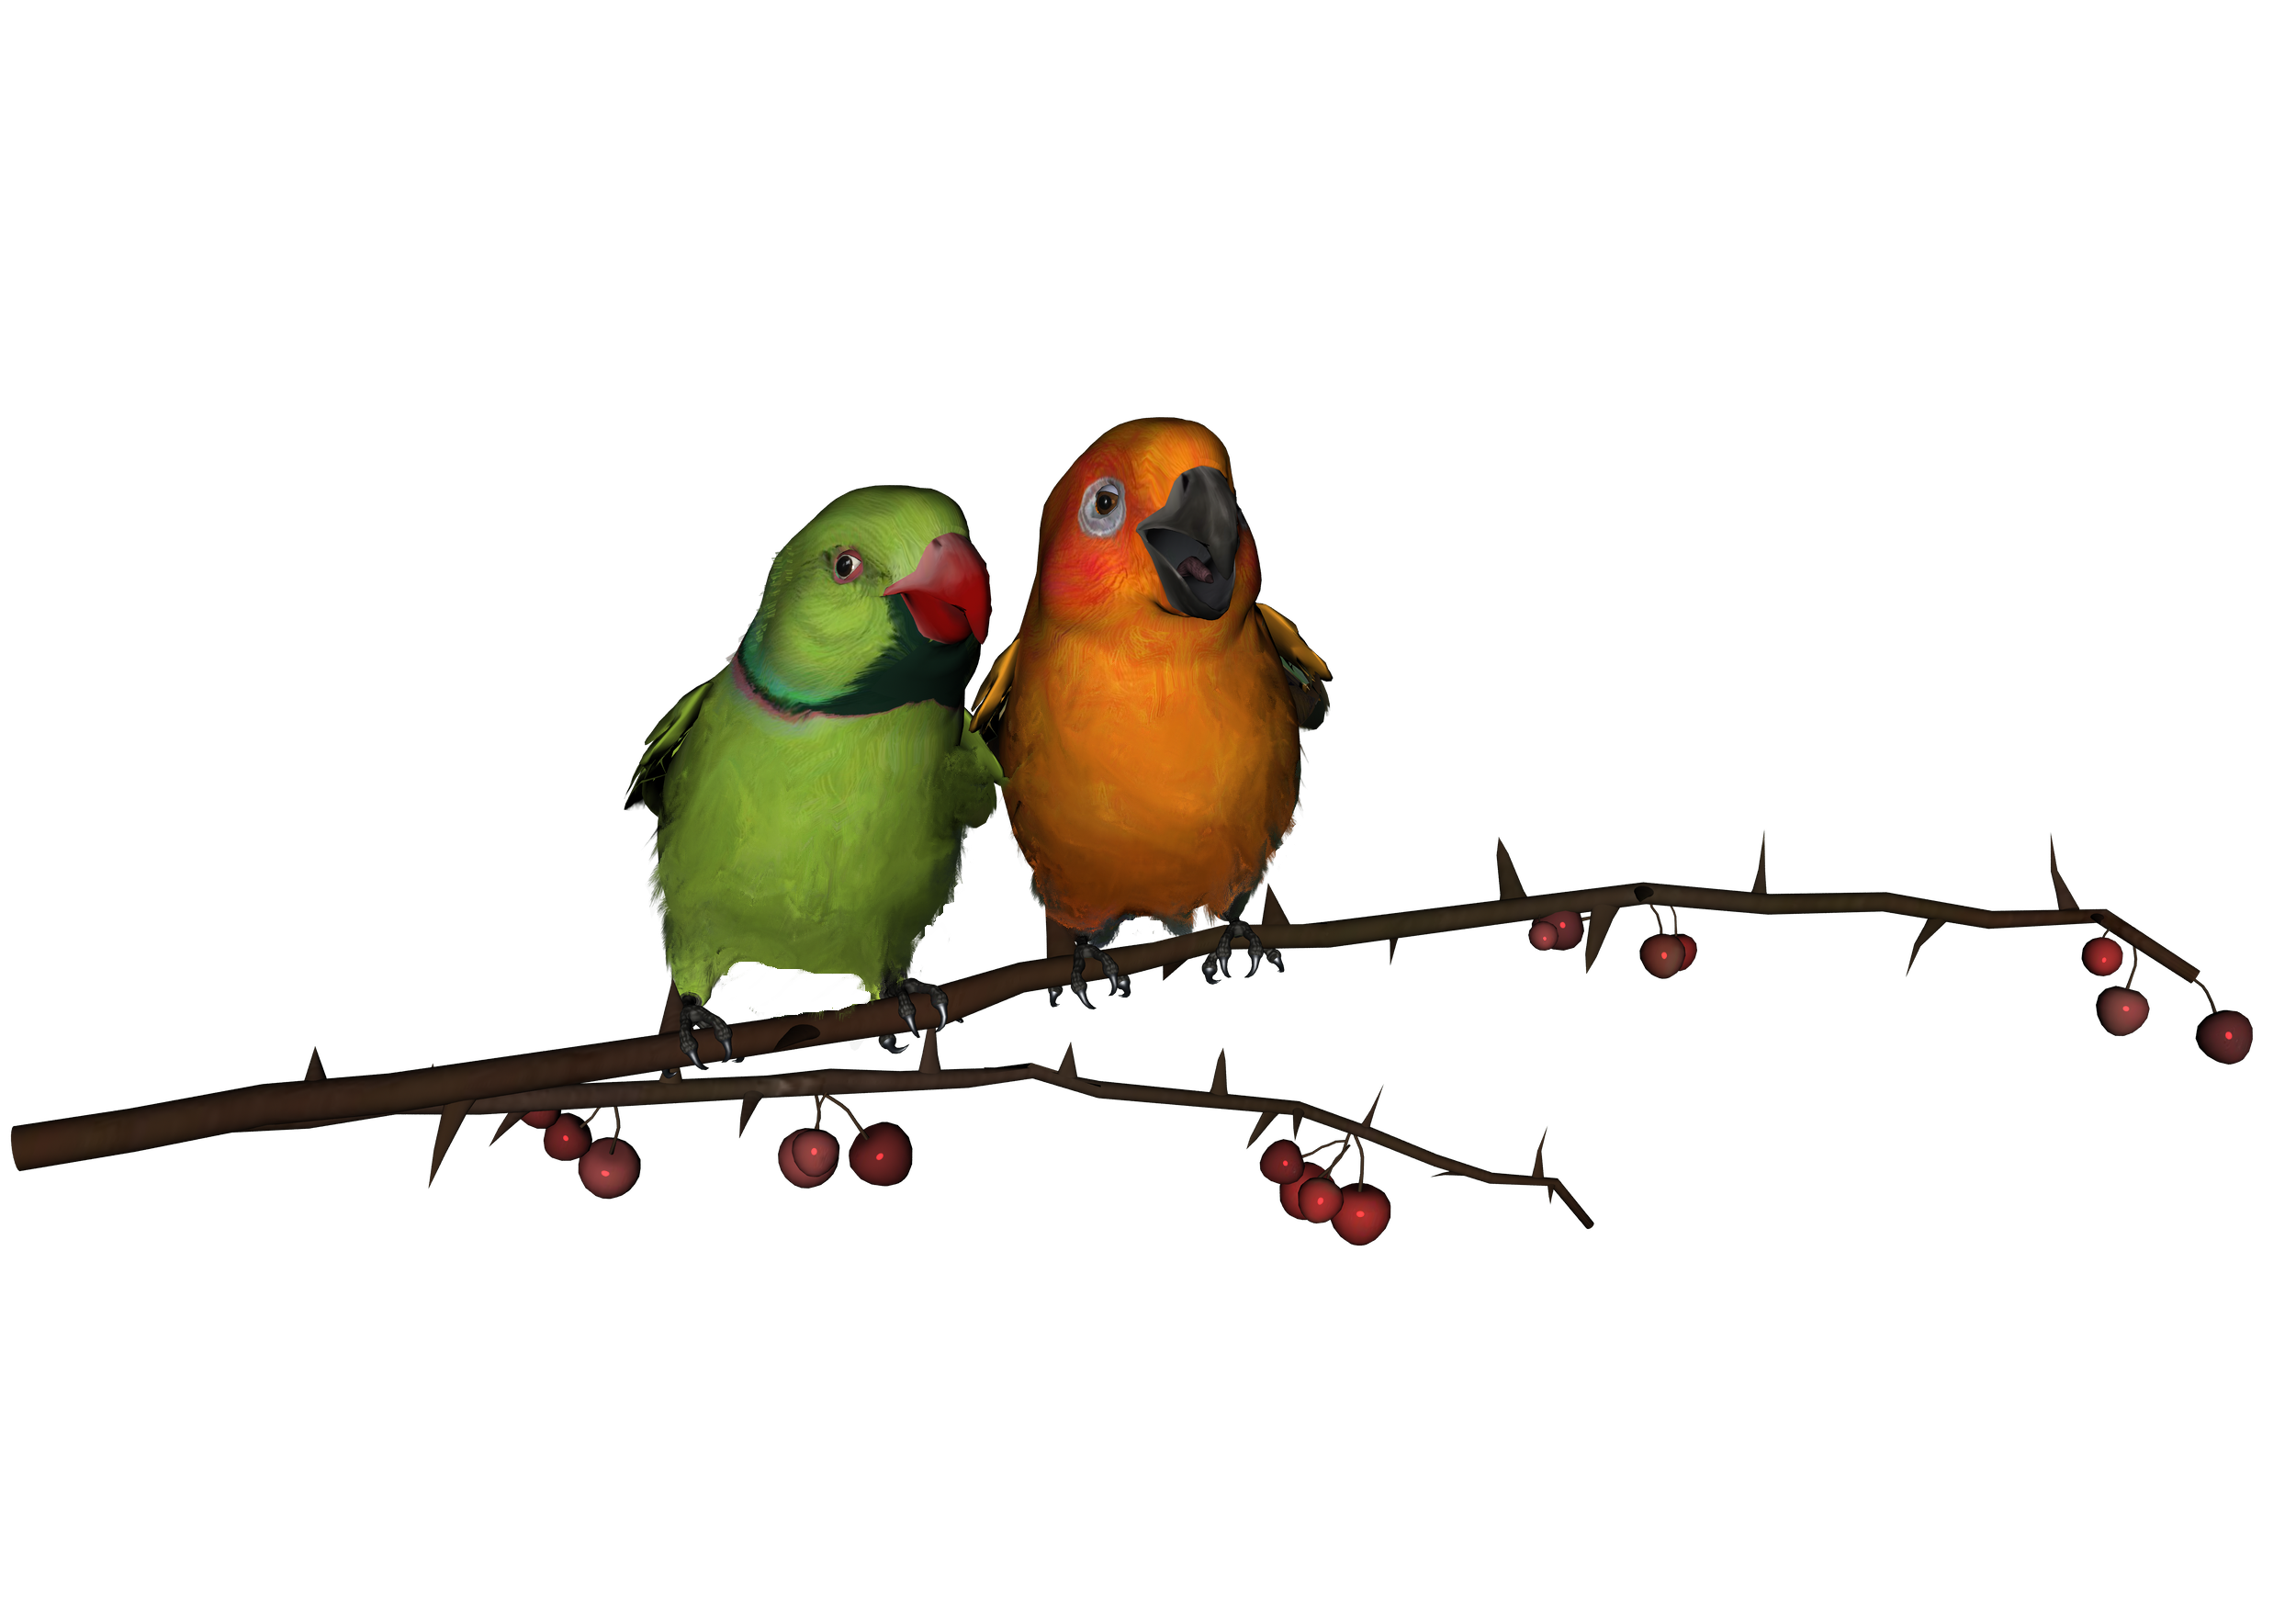 Love Birds Png - Pluspng, Transparent background PNG HD thumbnail